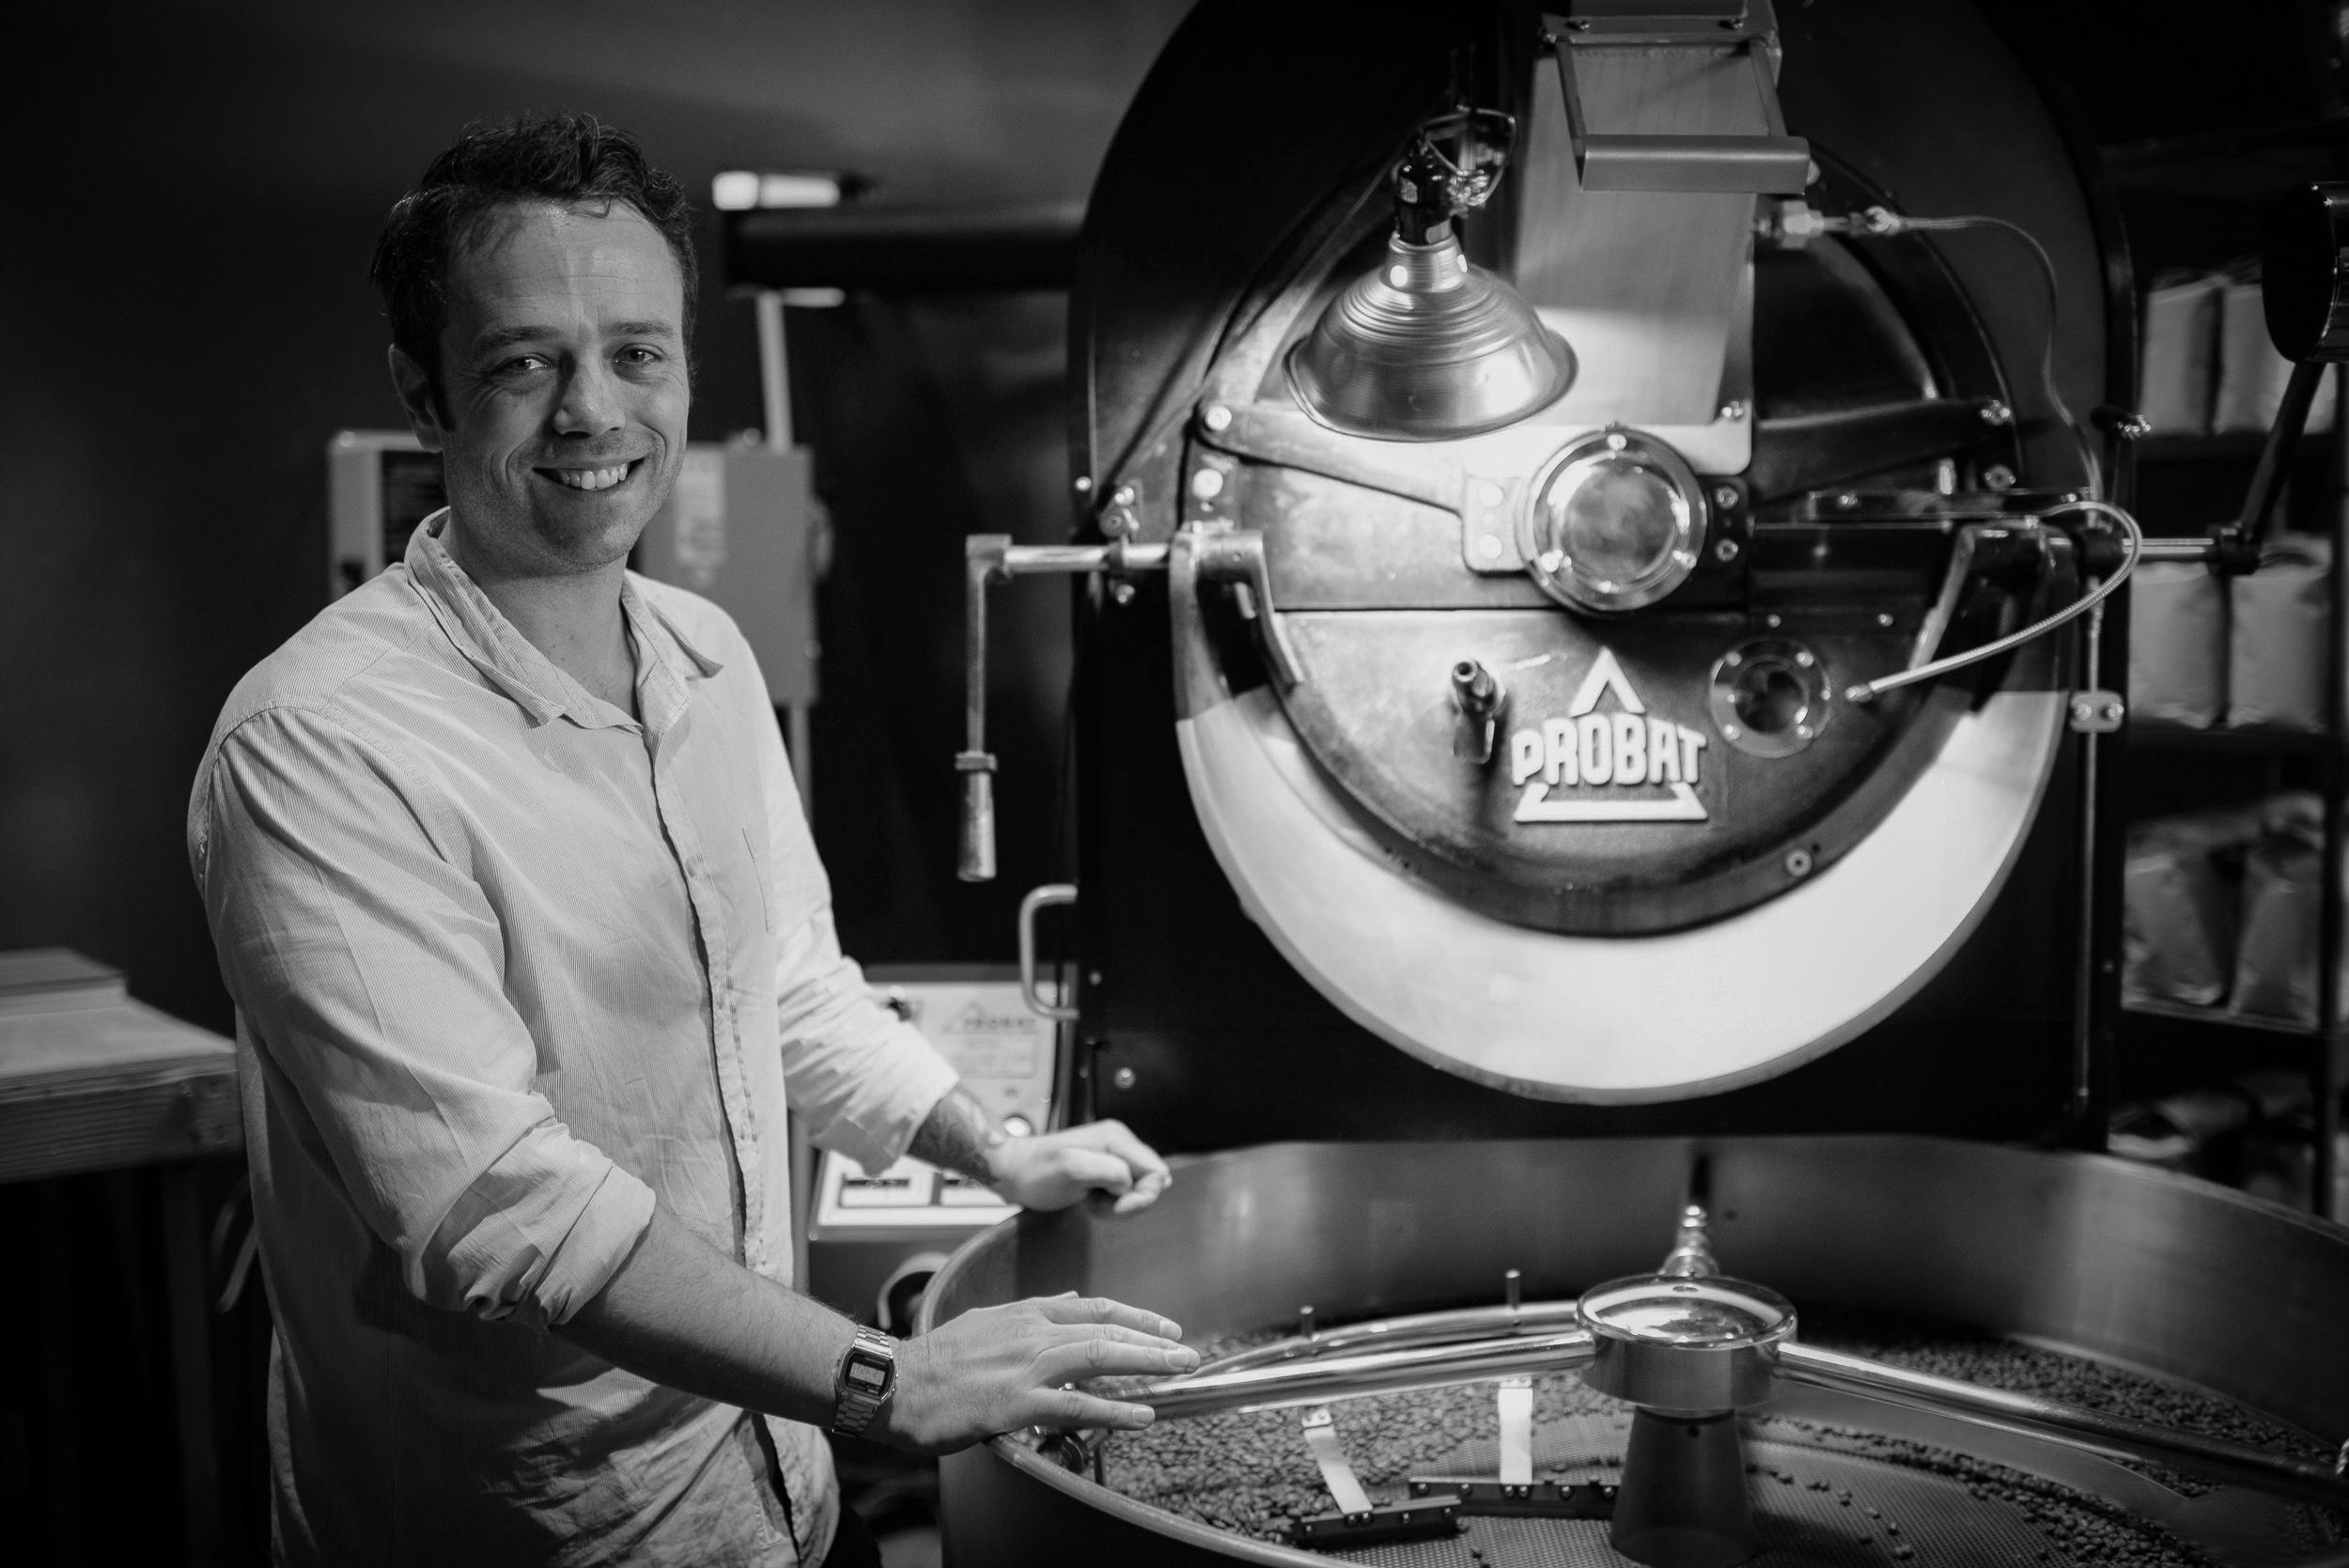 Deaton Pigot, Roaster, Toby's Estate Coffee